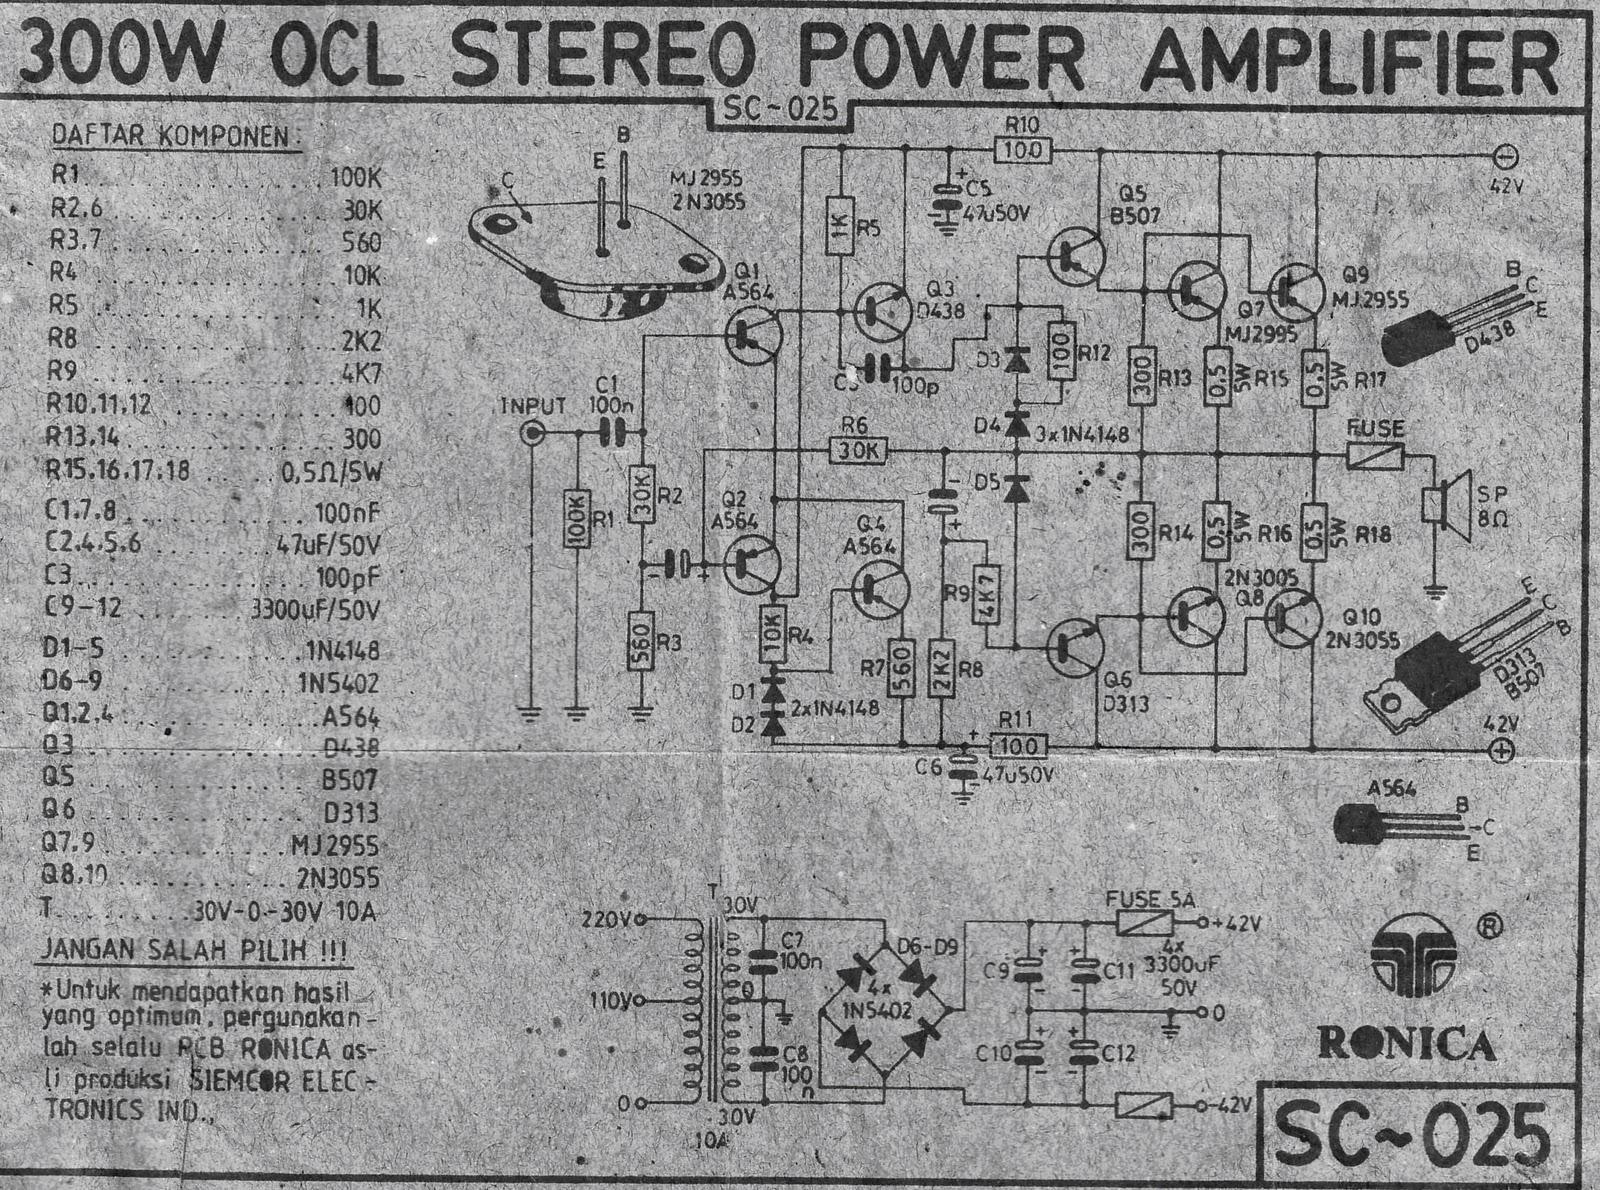 small resolution of 300w power amplifier ocl circuit audiobbm com let s do it simple electric generator diagram http polnischesteinkohleeu